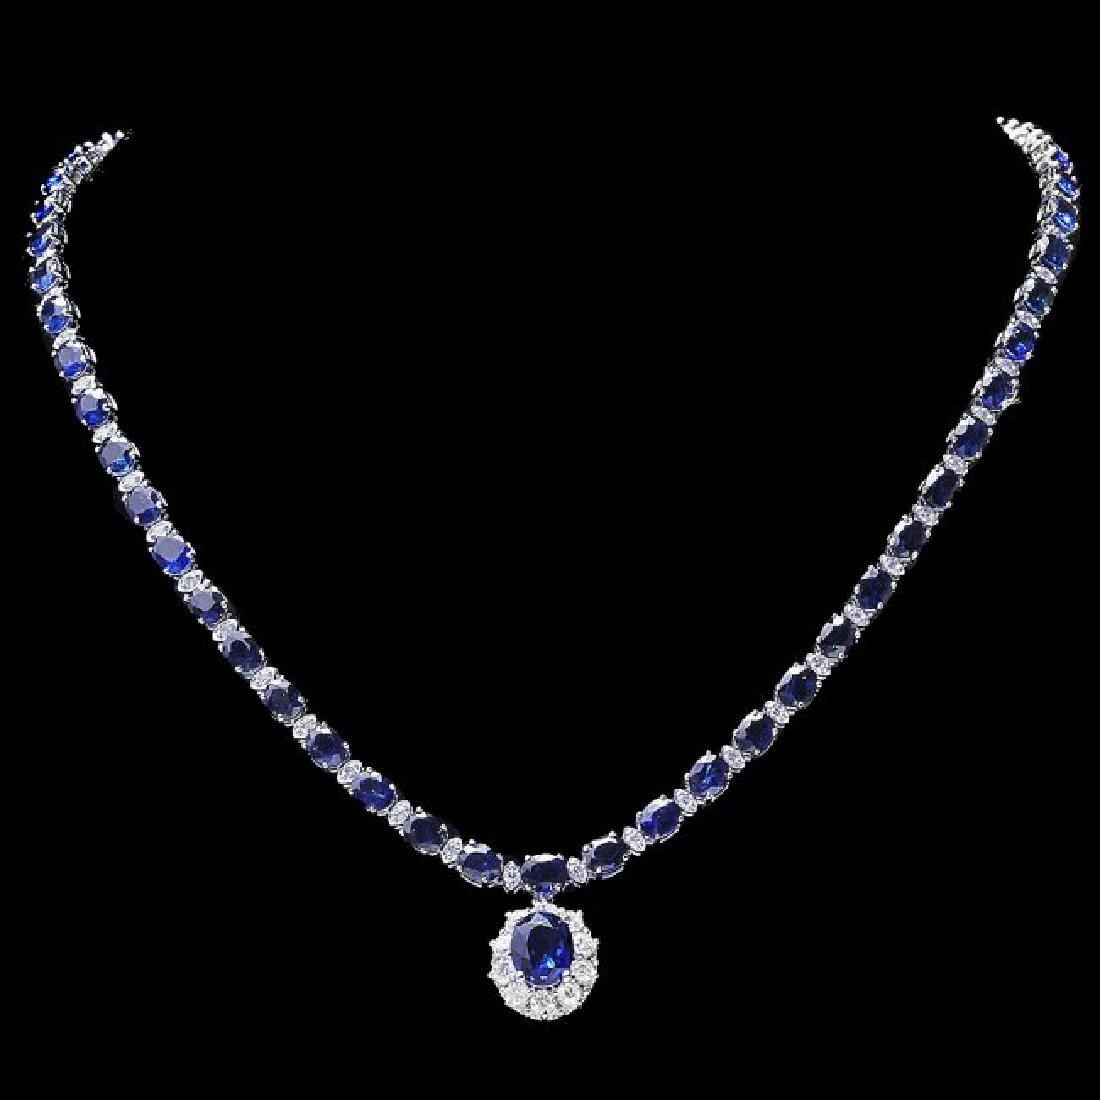 14k Gold 29ct Sapphire 2.25ct Diamond Necklace - 2